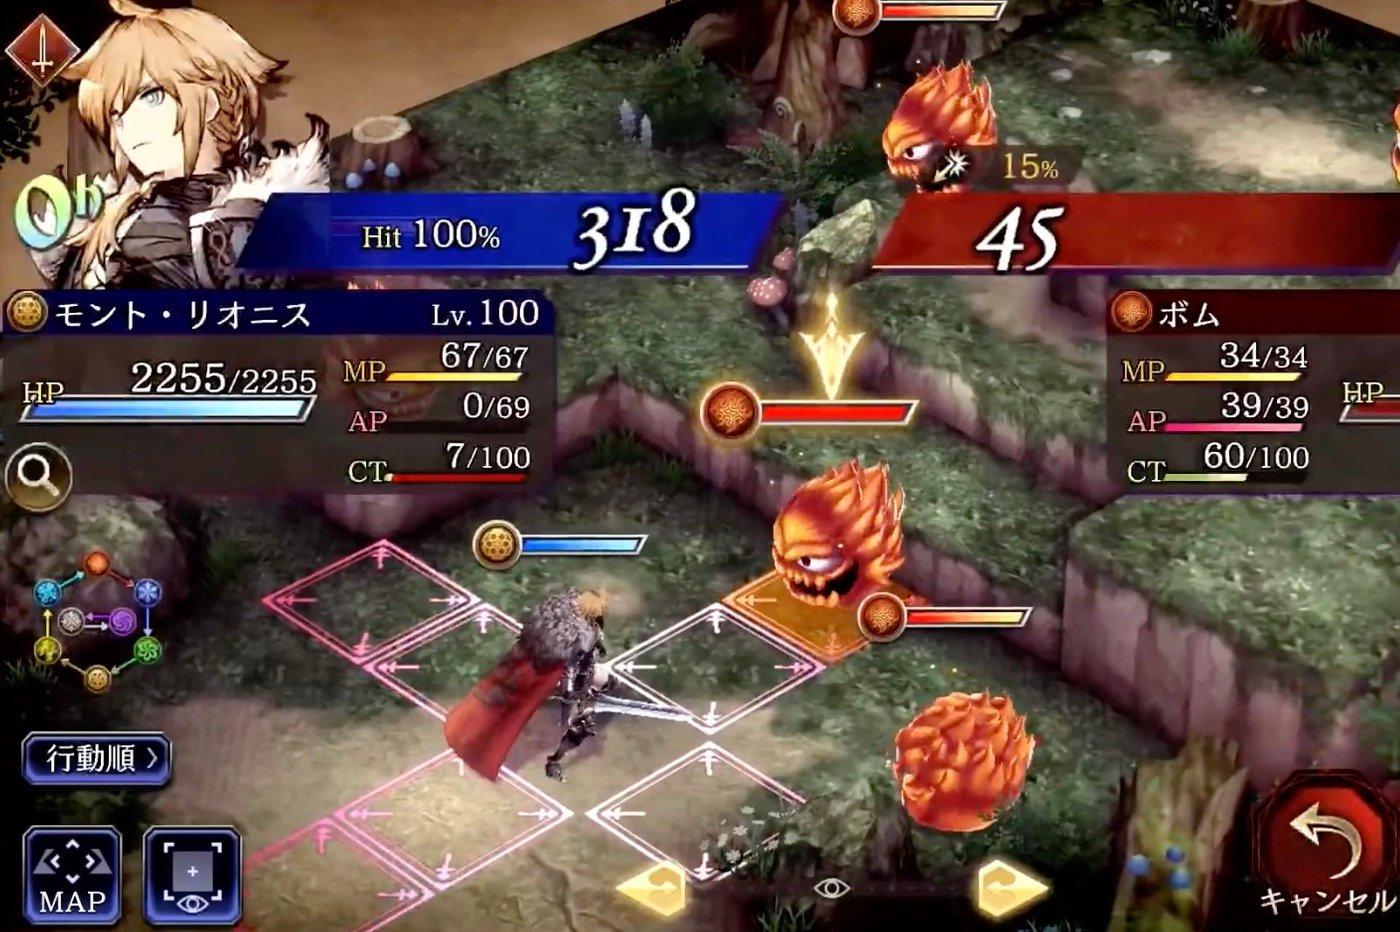 War Of the Visions : jolie vidéo de gameplay pour ce jeu à la Final Fantasy Tactics 1